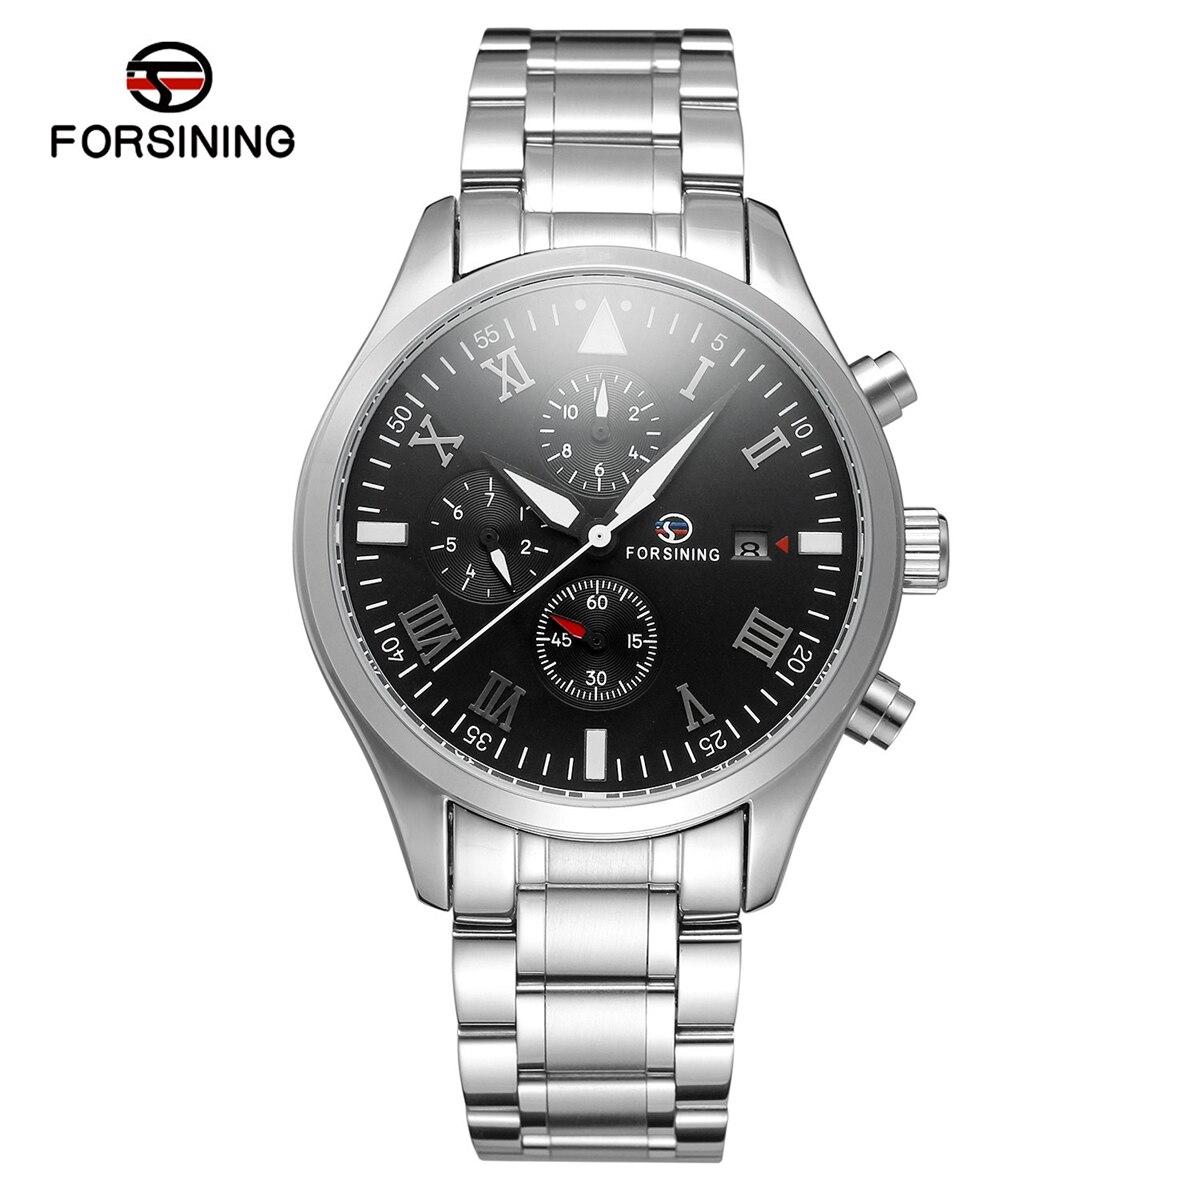 FORSINING Brand Men Watches Automatic Mechanical Watch Sport Clock Steel Casual Business Wristwatch Black relojes hombre<br>